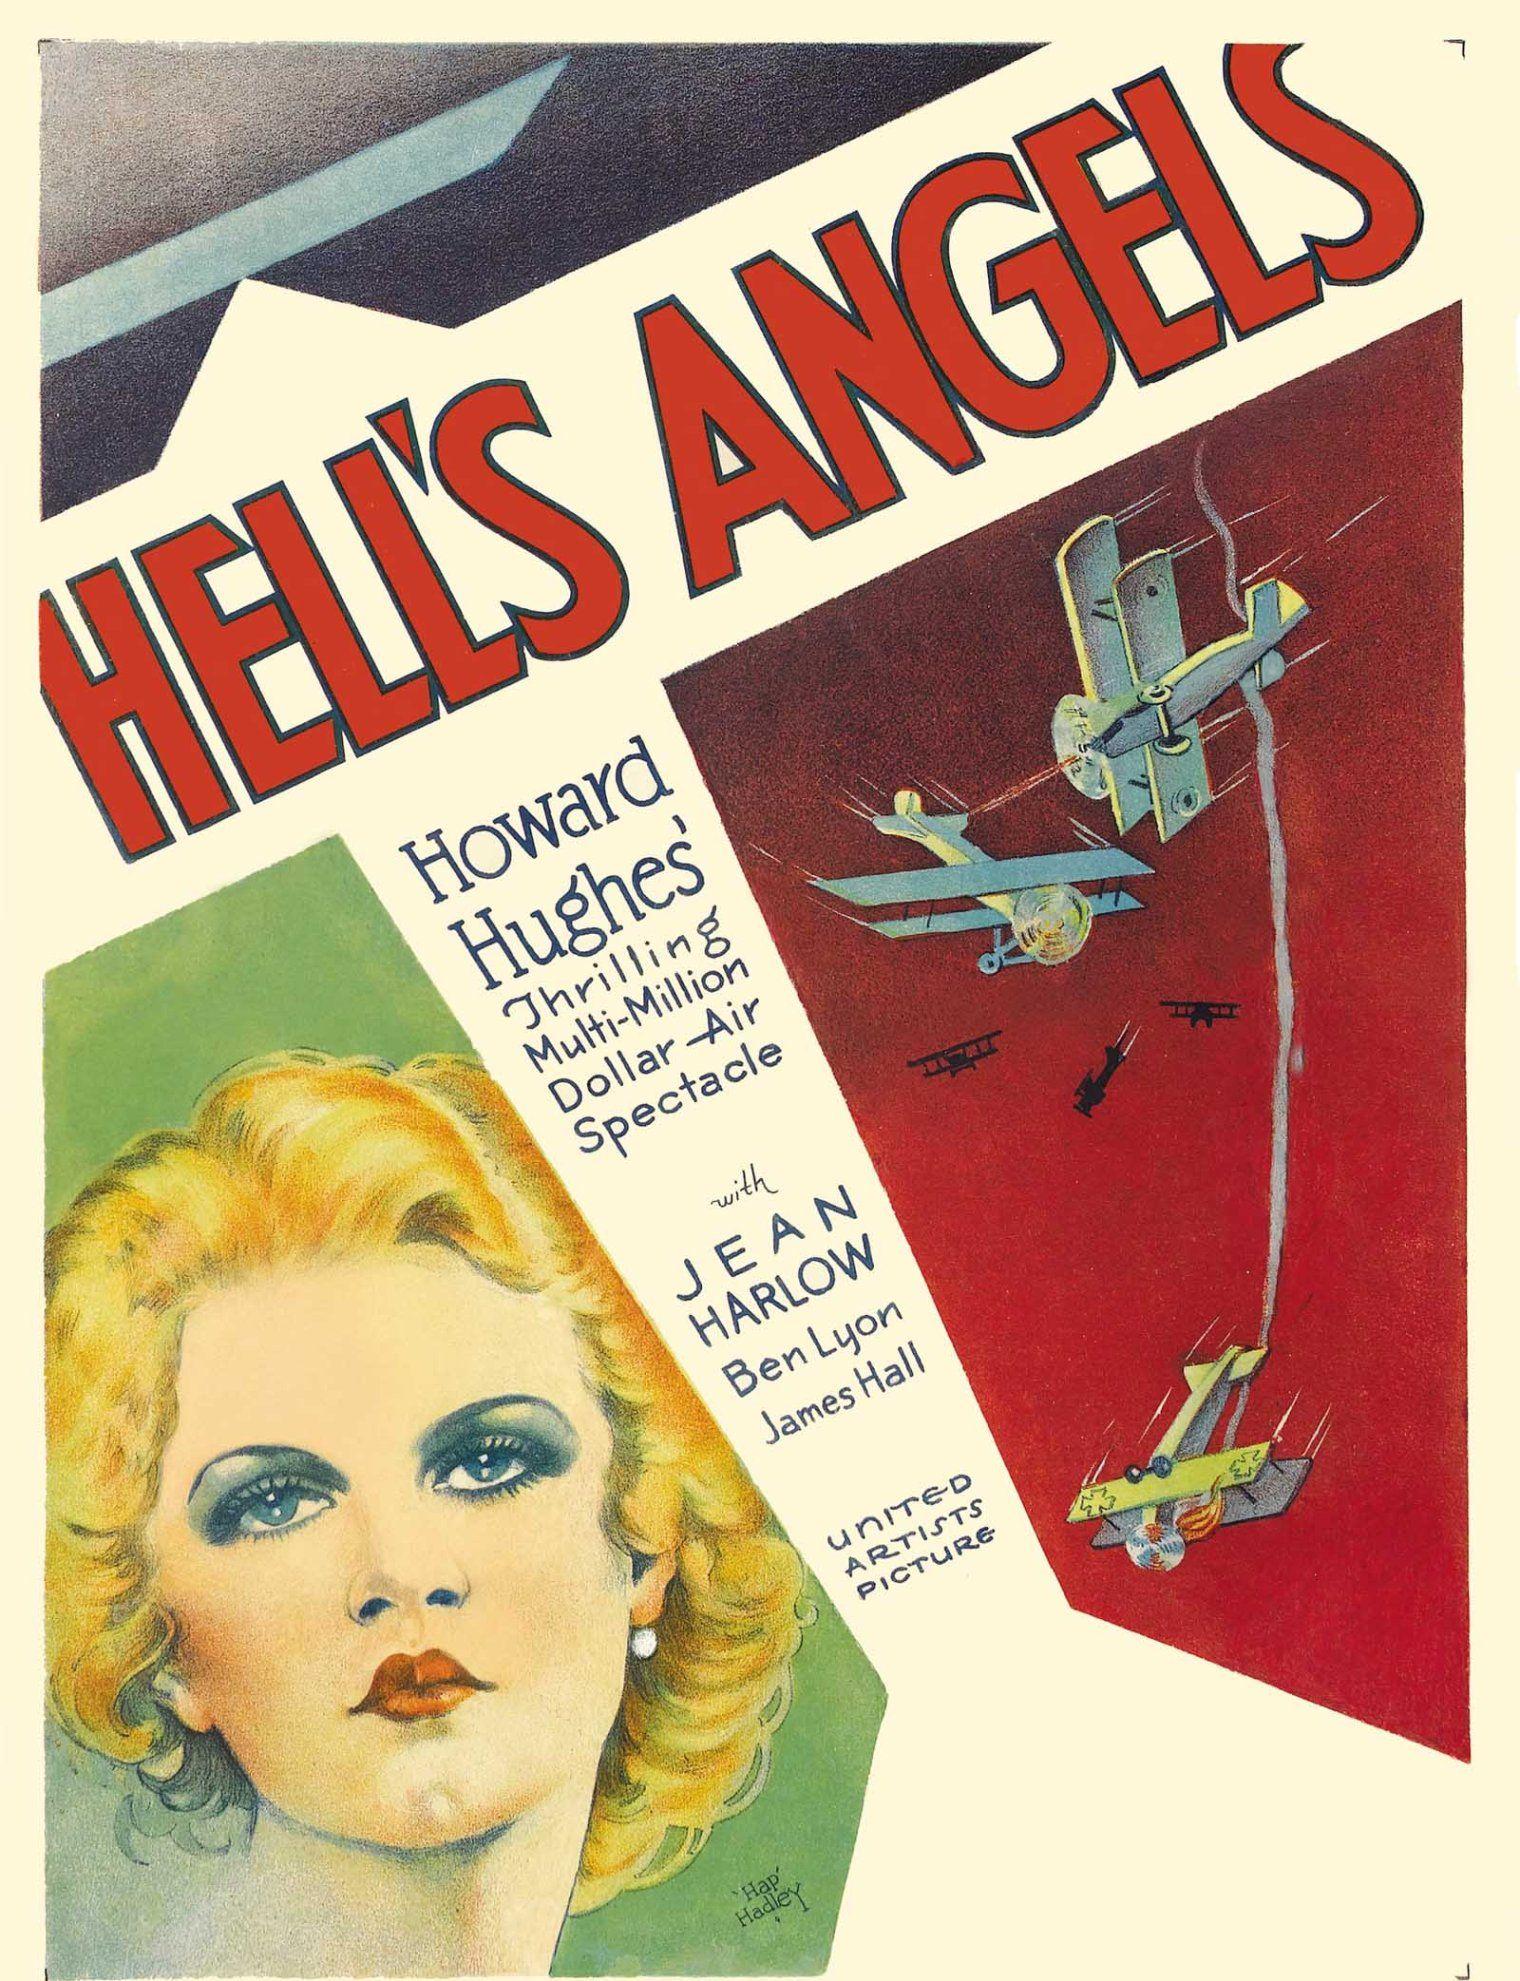 hells-angels-howard-hughes-1930